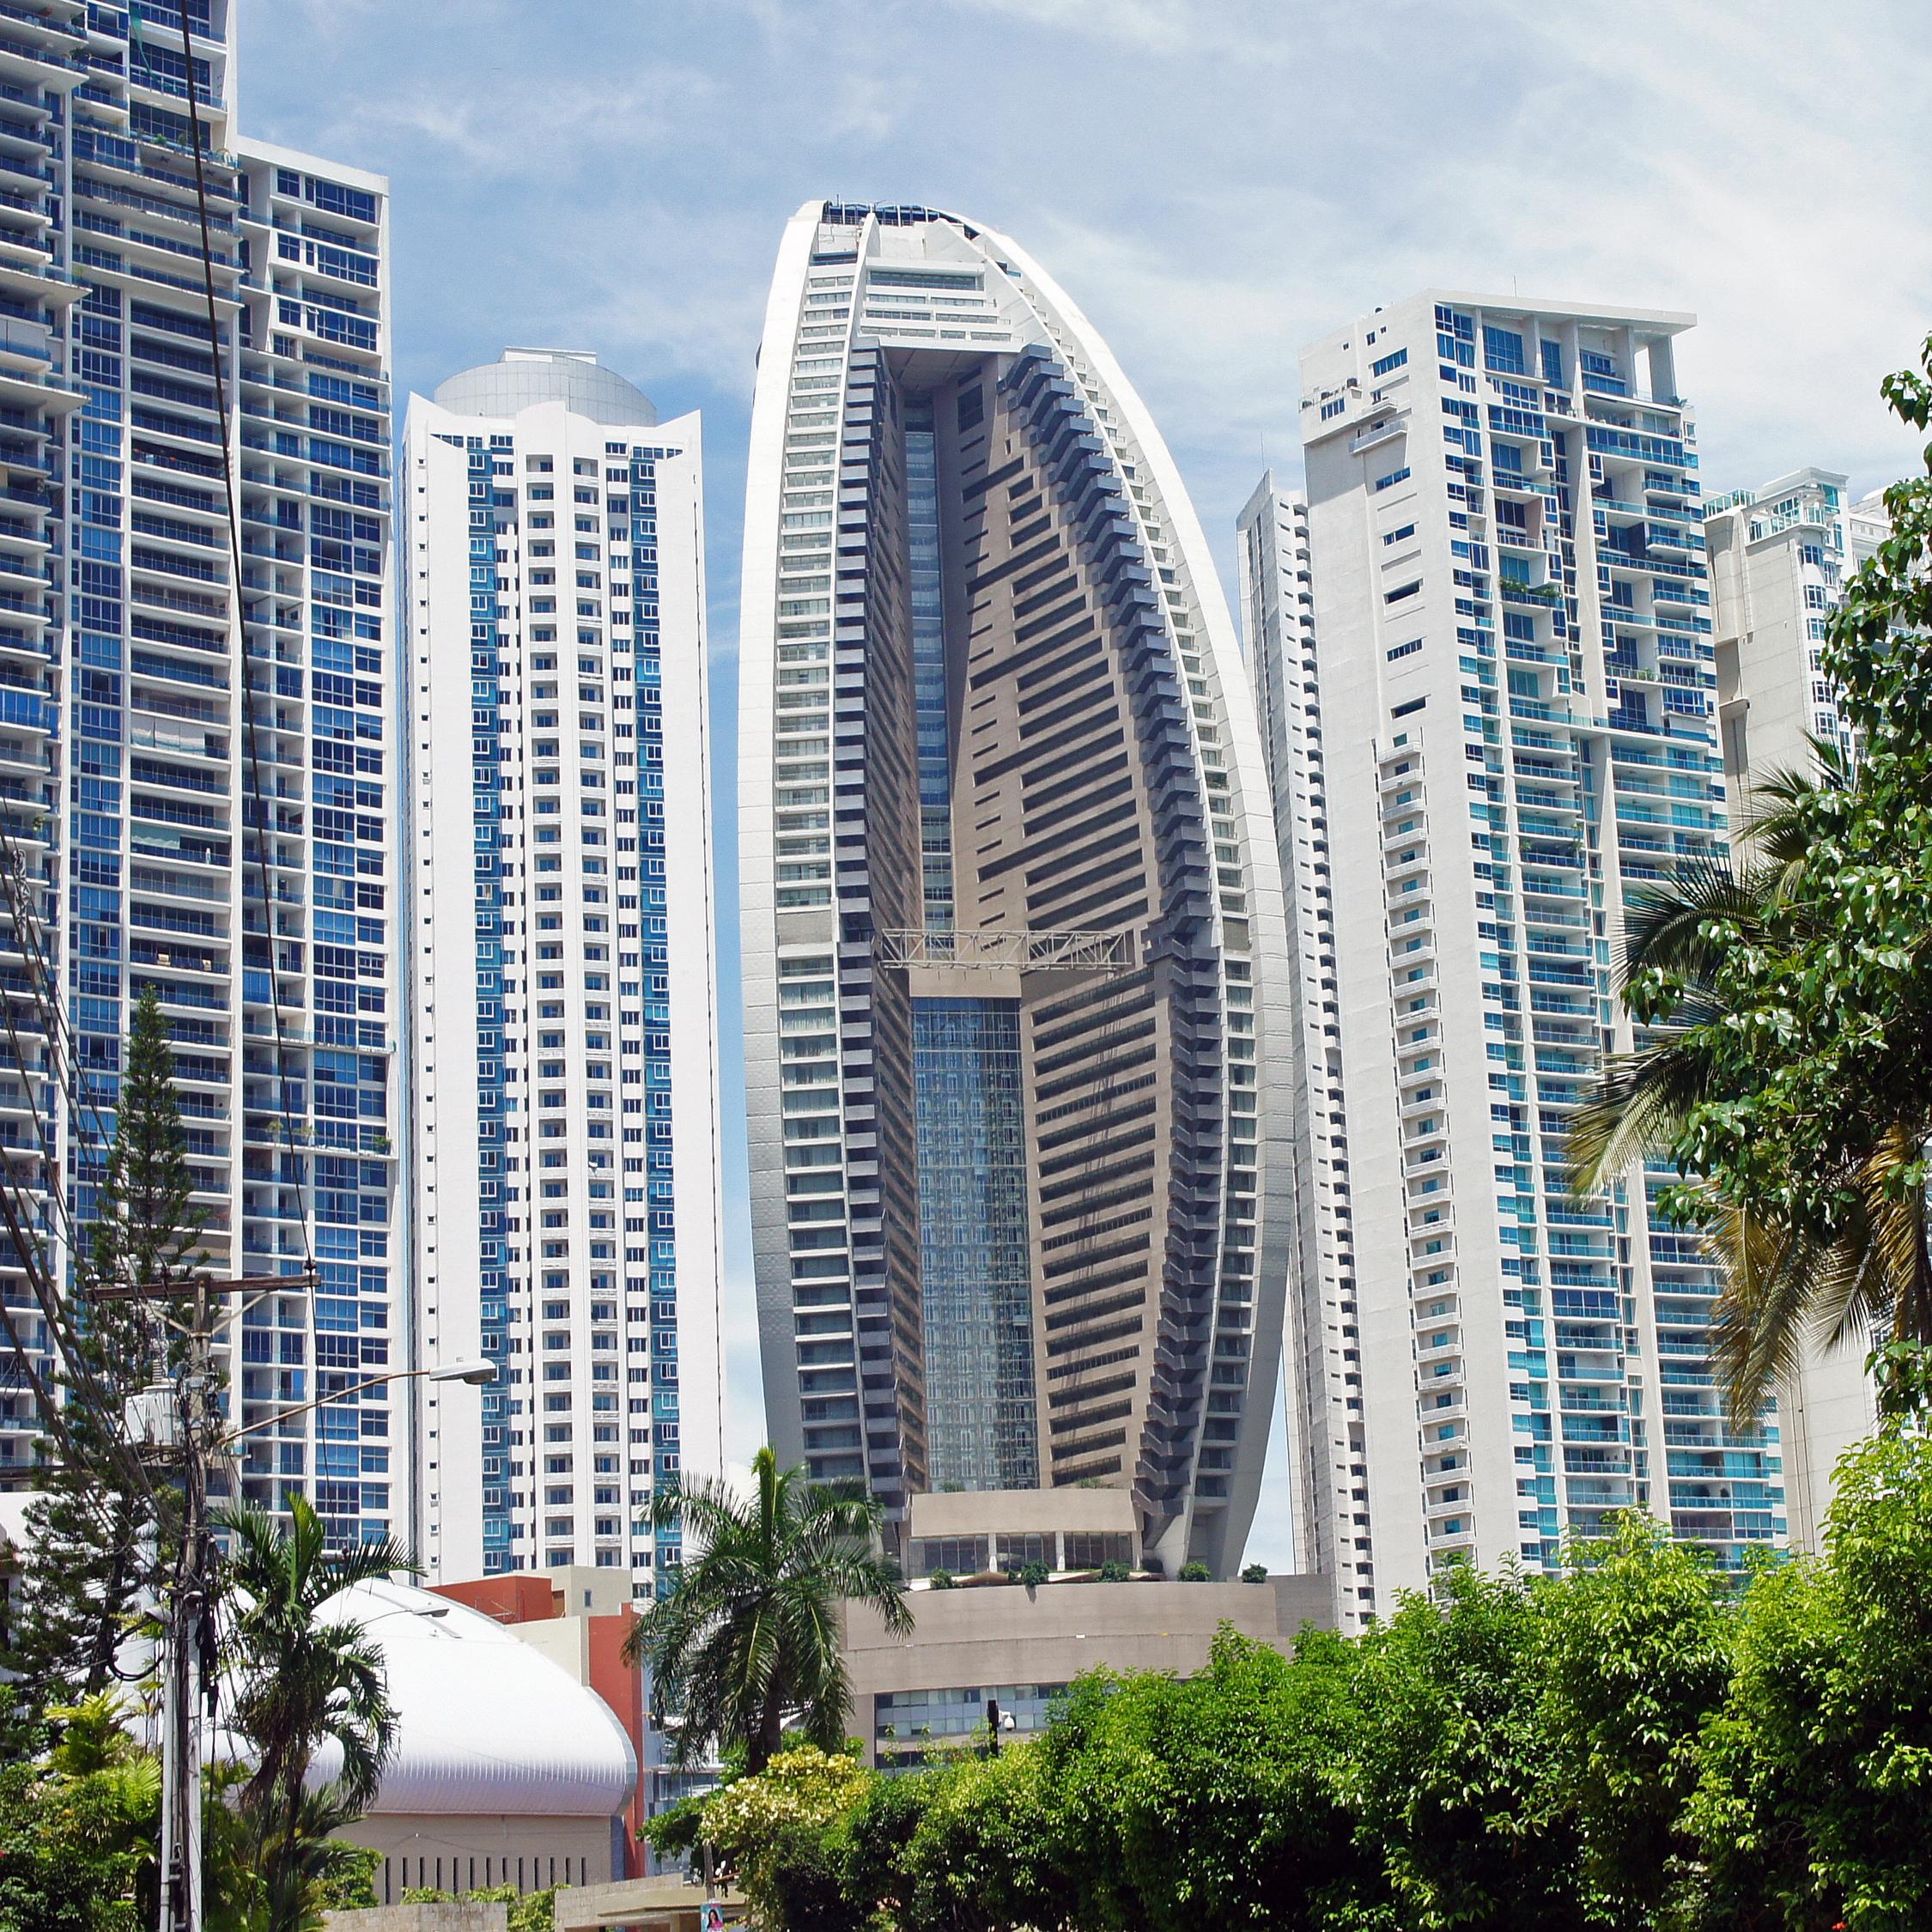 Description Panama 08 2013 Trump Ocean Club Tower 7090.JPG